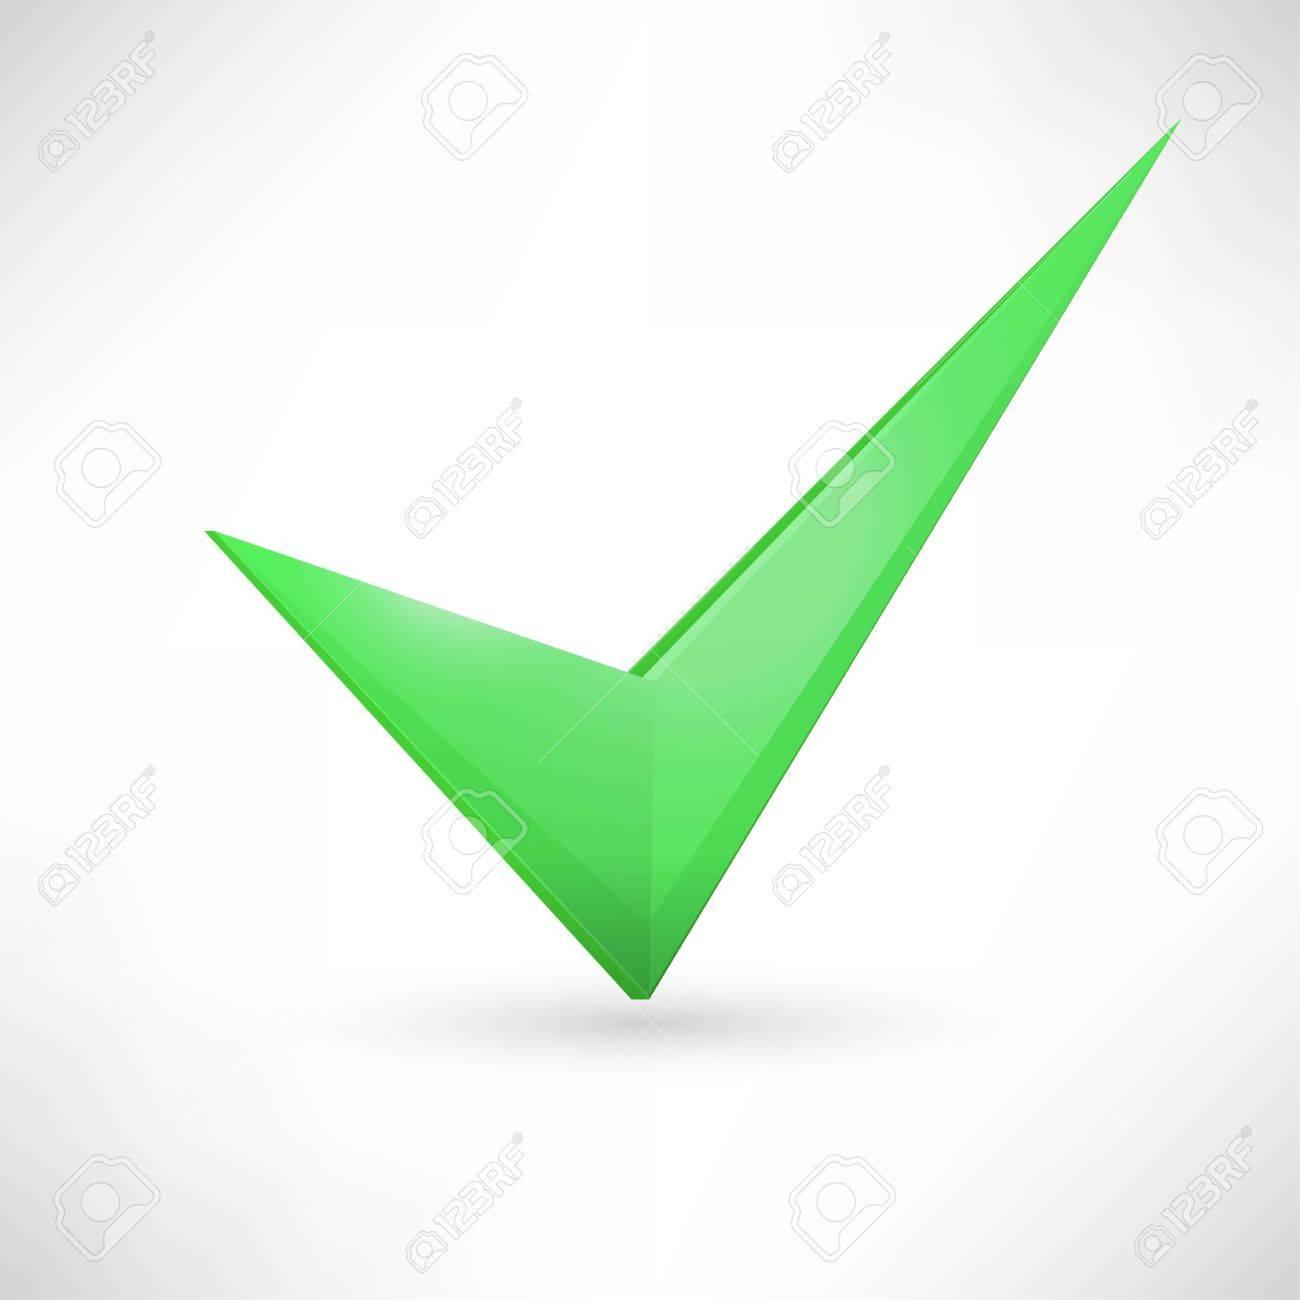 green checkmark. - 21992209